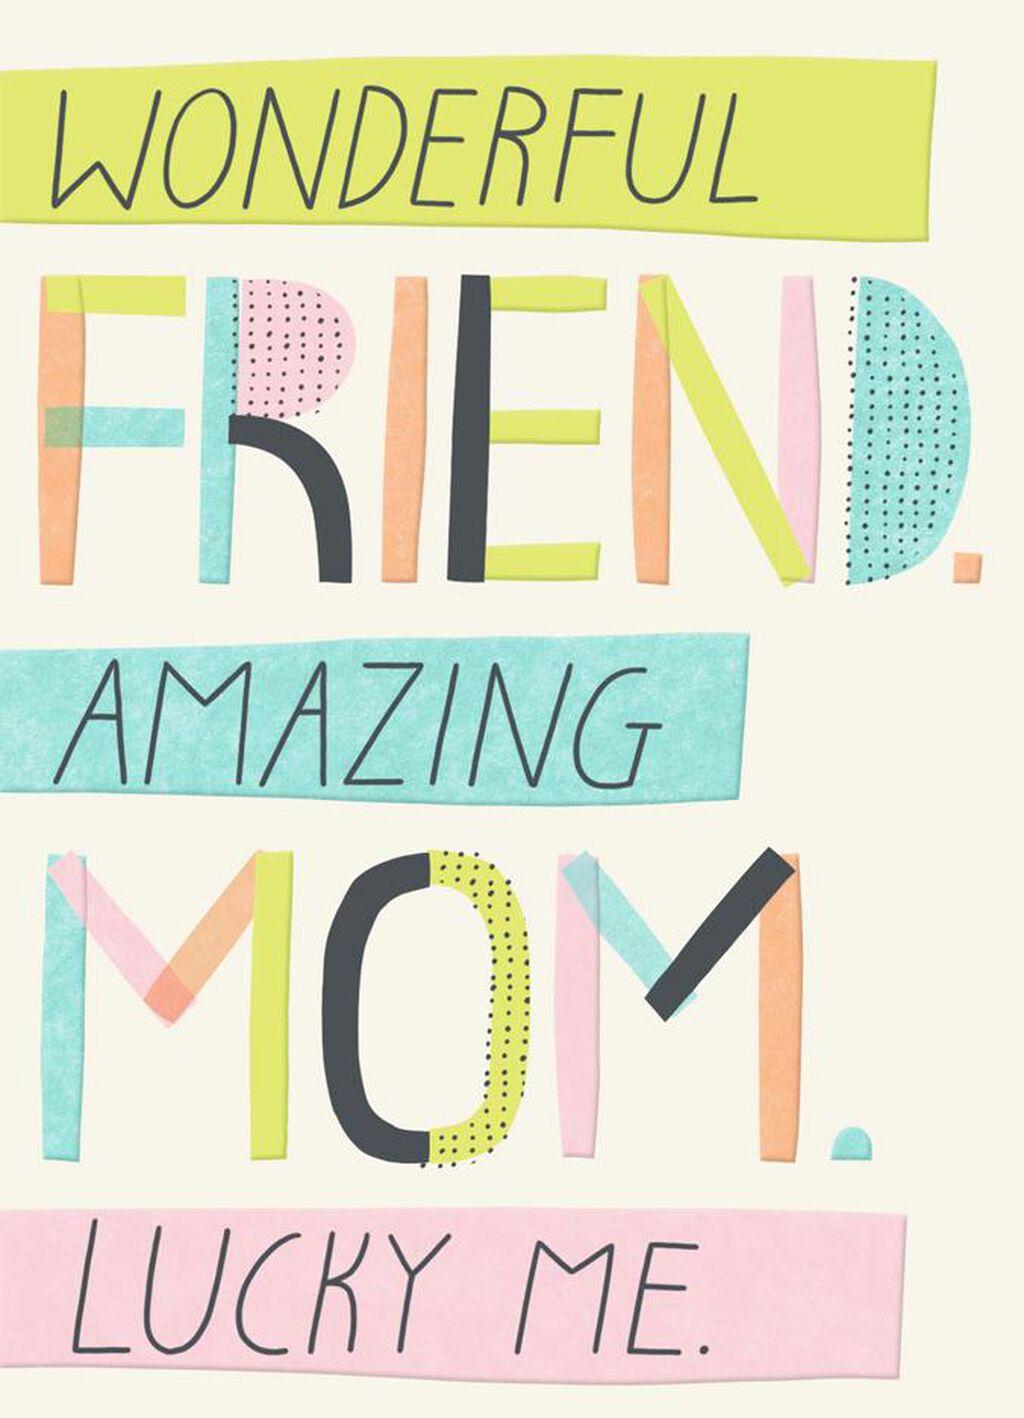 Wonderful friend mothers day card greeting cards hallmark m4hsunfo